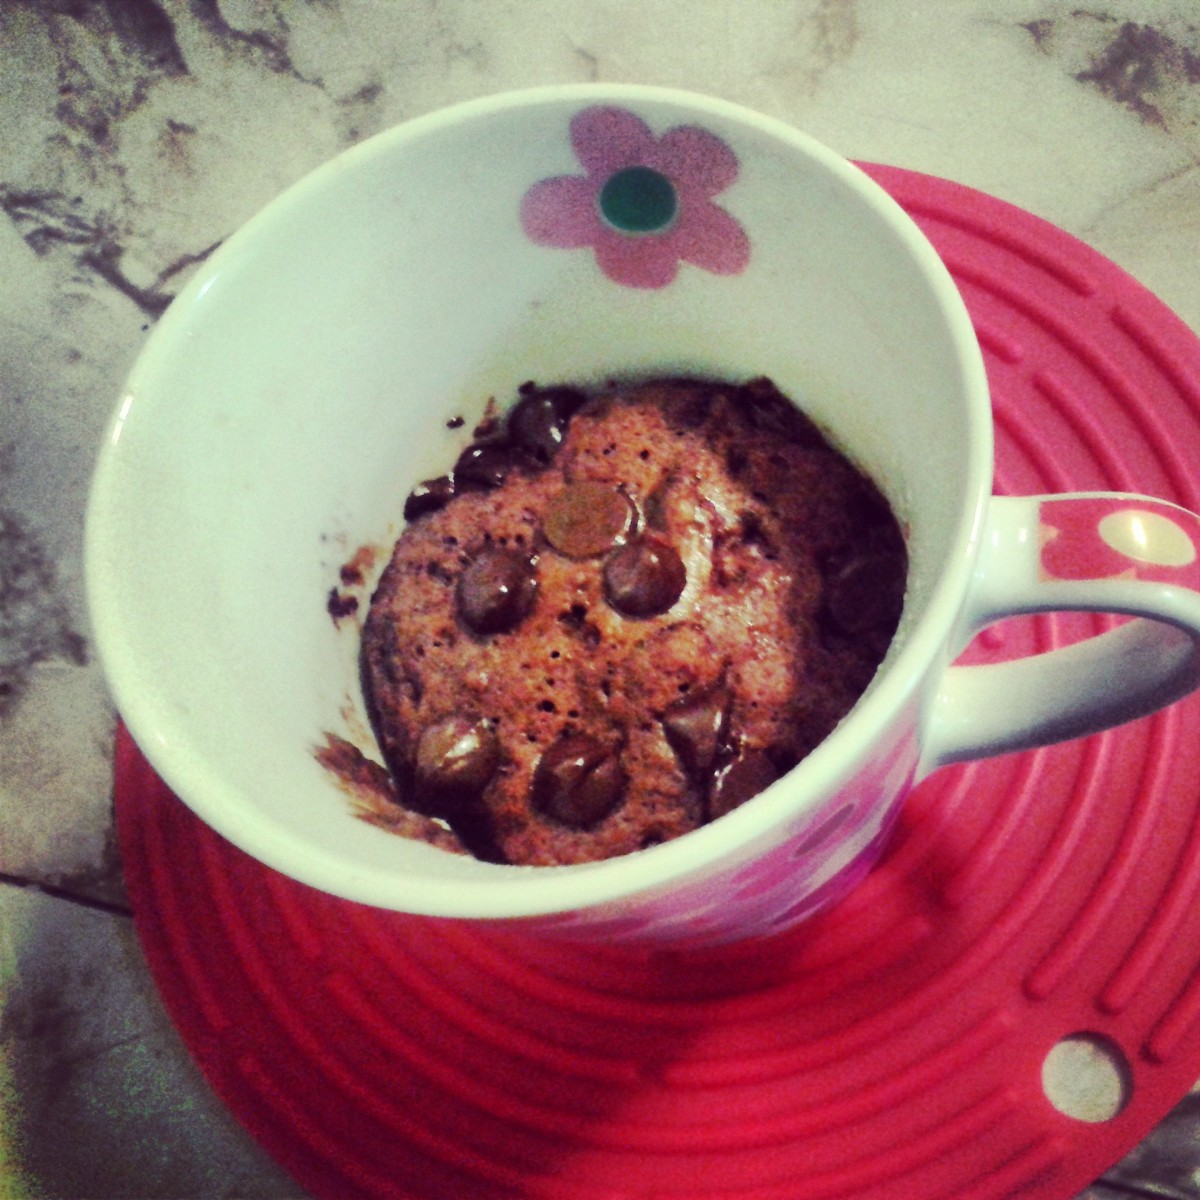 Comment Remplacer Les Oeufs Cake